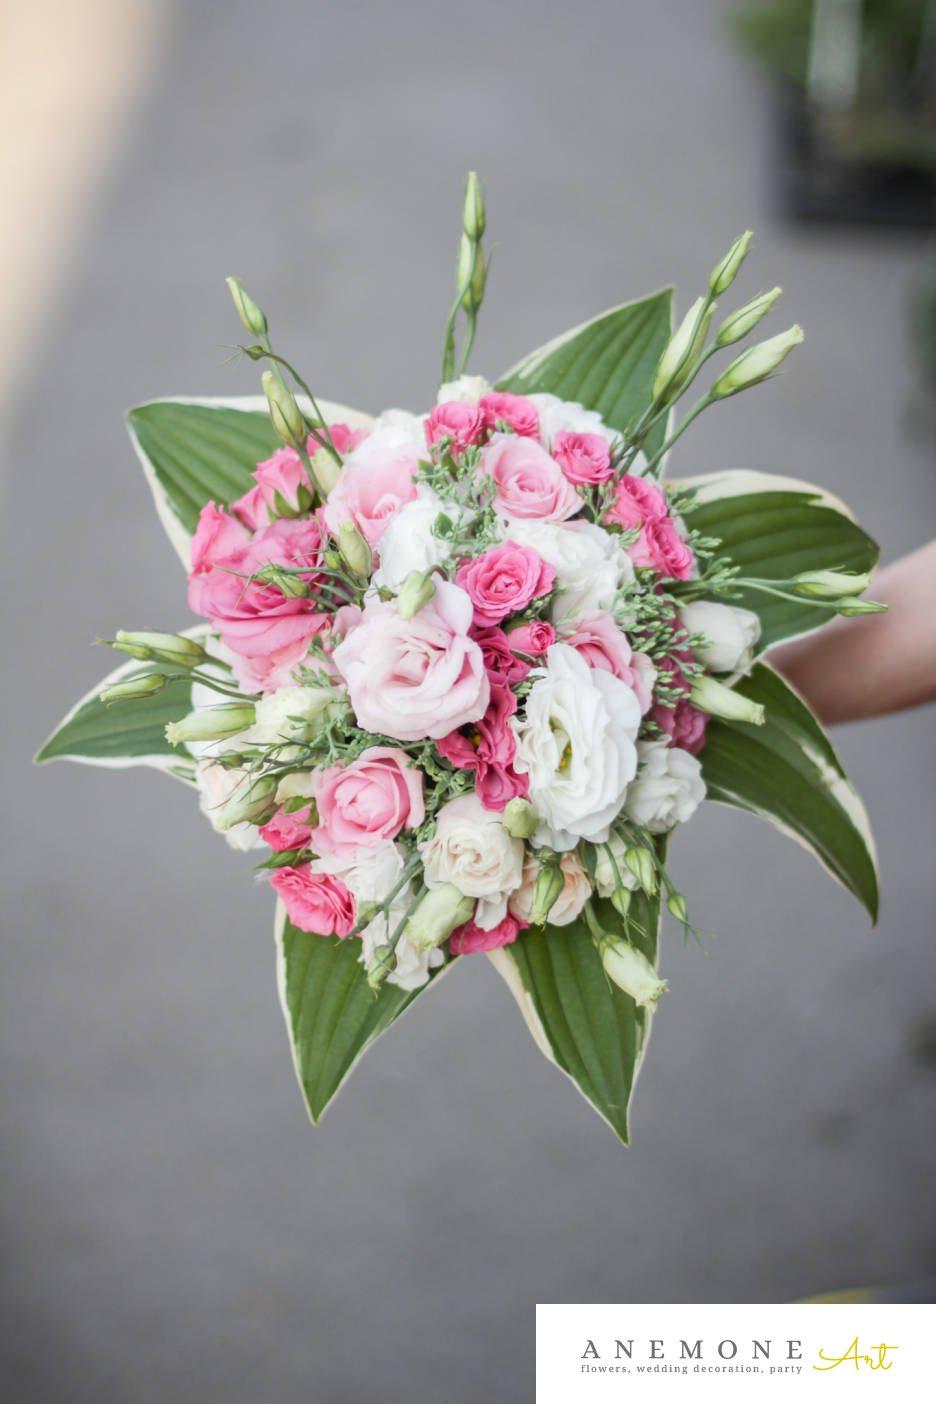 Poza, foto cu Flori de nunta alb, buchet cununie, lisianthus, mini-rosa, rotund, roz, trandafiri in Arad, Timisoara, Oradea (wedding flowers, bouquets) nunta Arad, Timisoara, Oradea